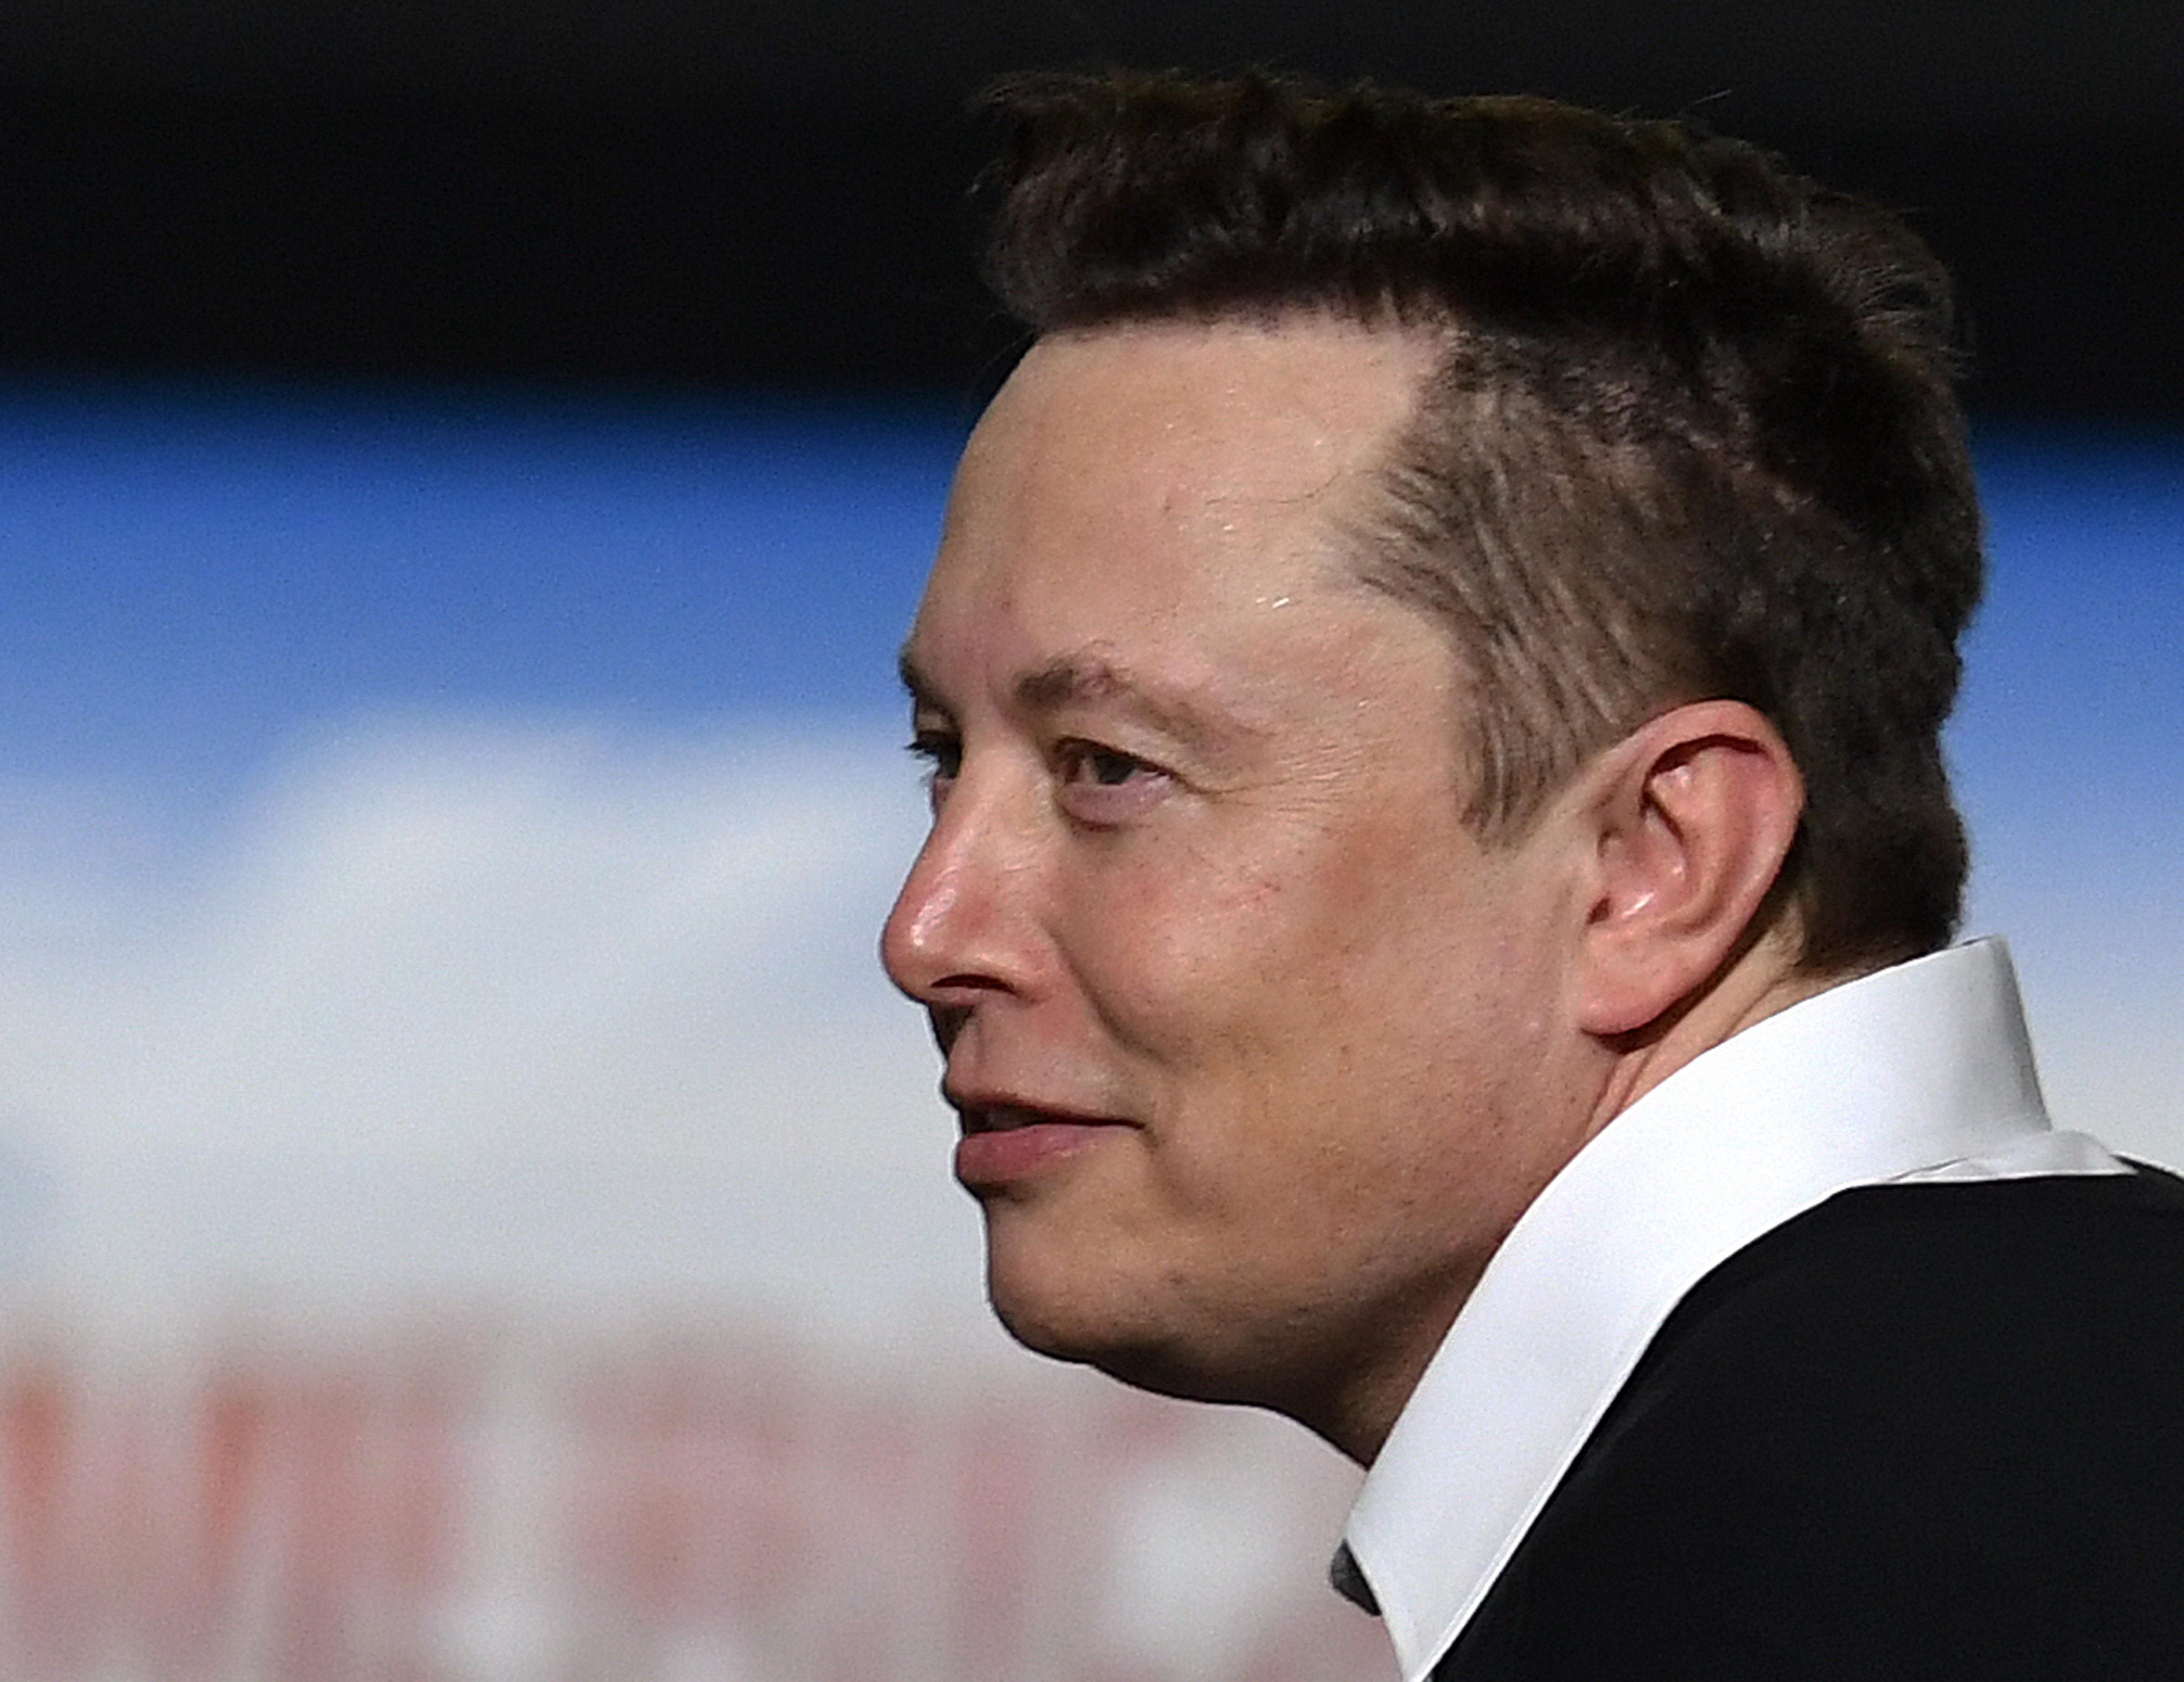 Elon Musk in profile.